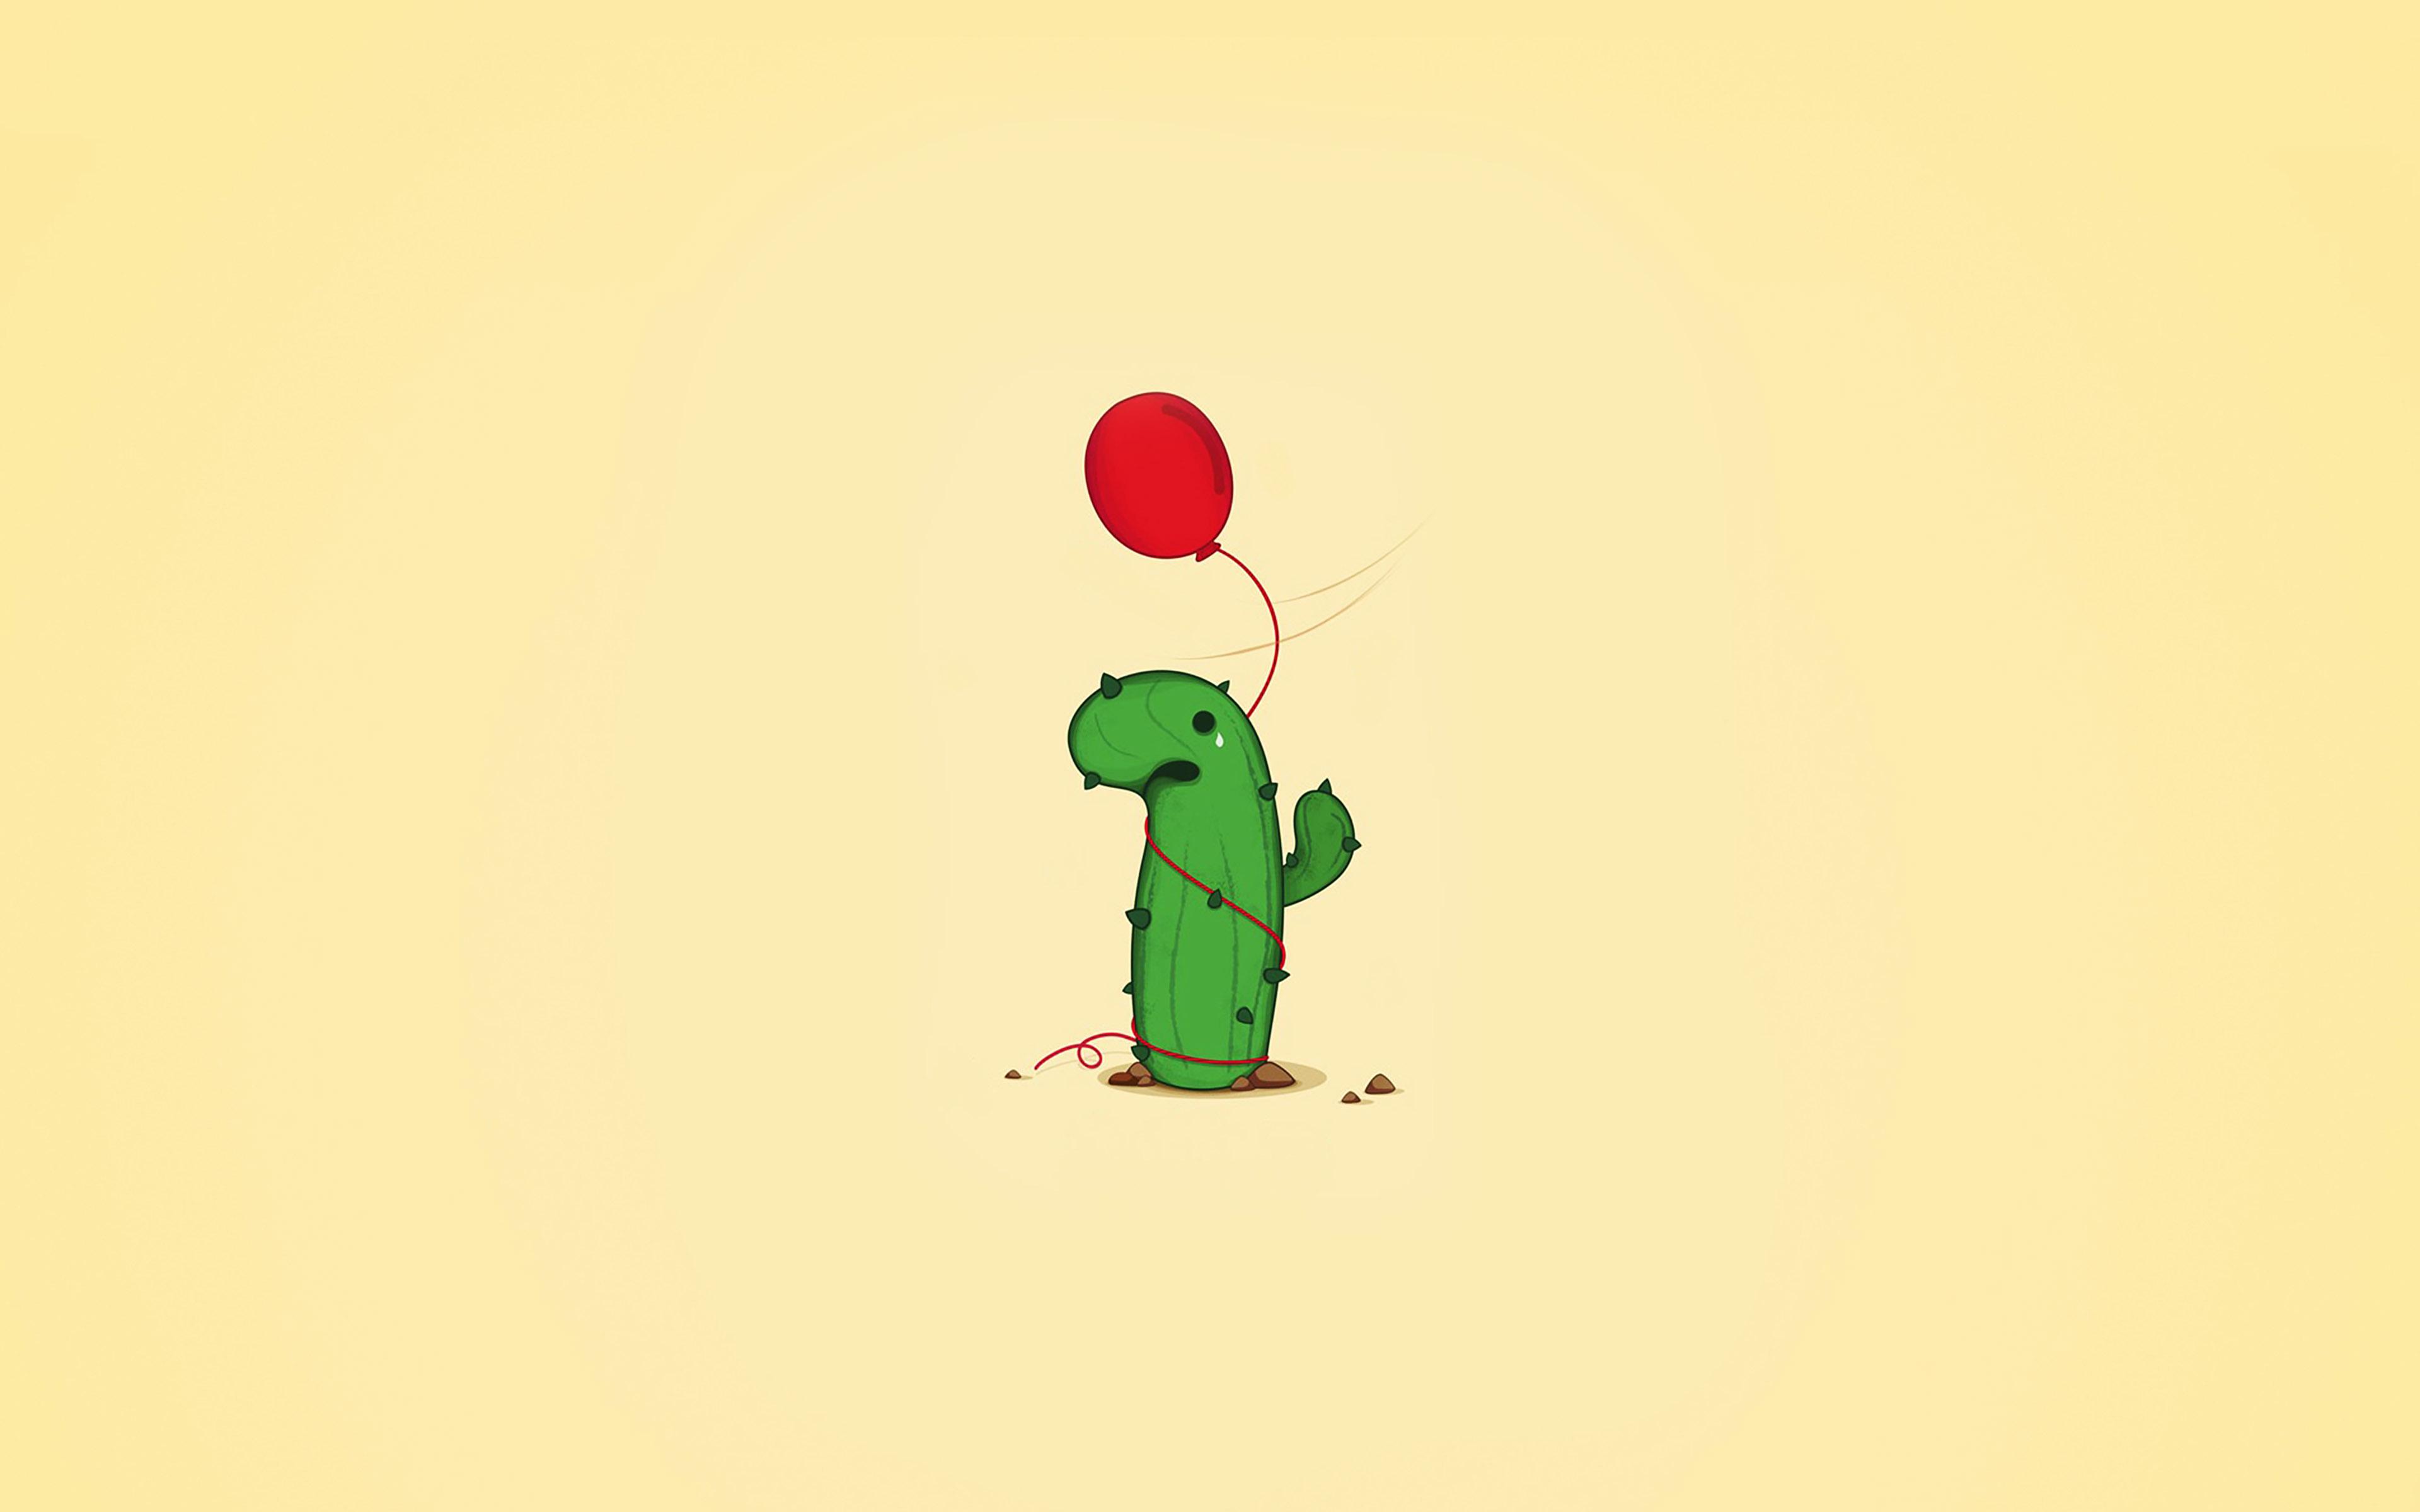 Cute Cactus Wallpaper Macbook Ai35 Cute Cactus Ballon Illust Art Minimal Papers Co